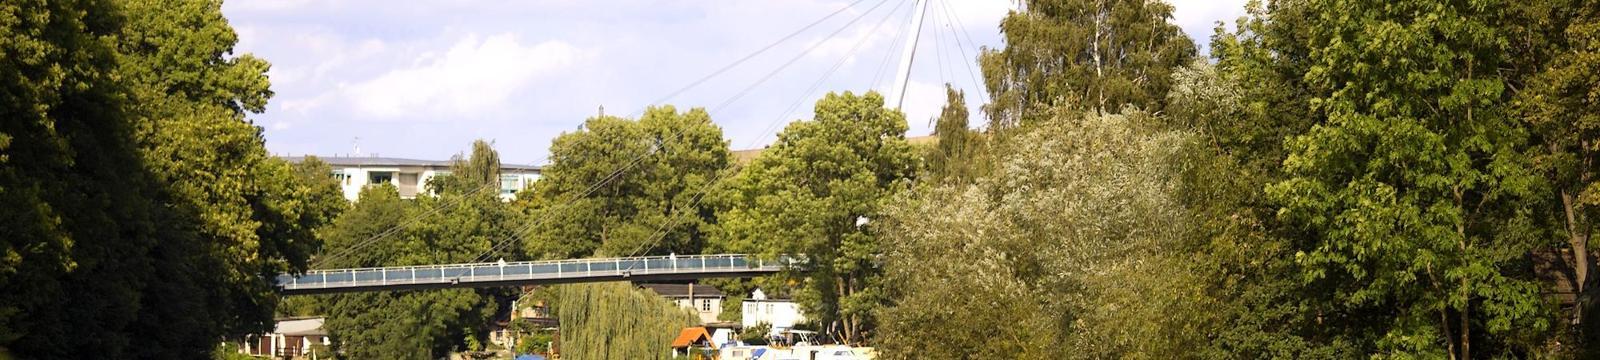 Poppen Halle